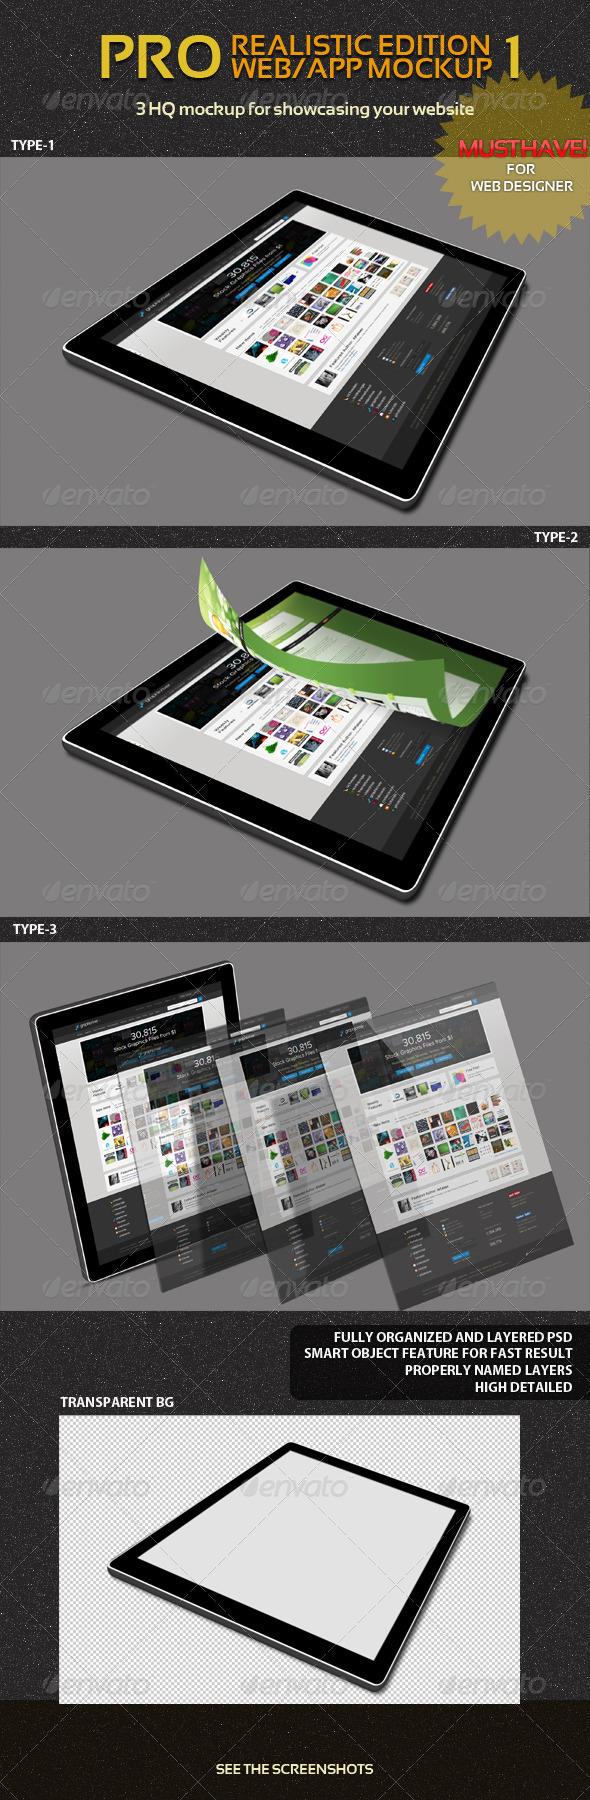 Pro Web/App Mockup Pack 1 - Website Displays